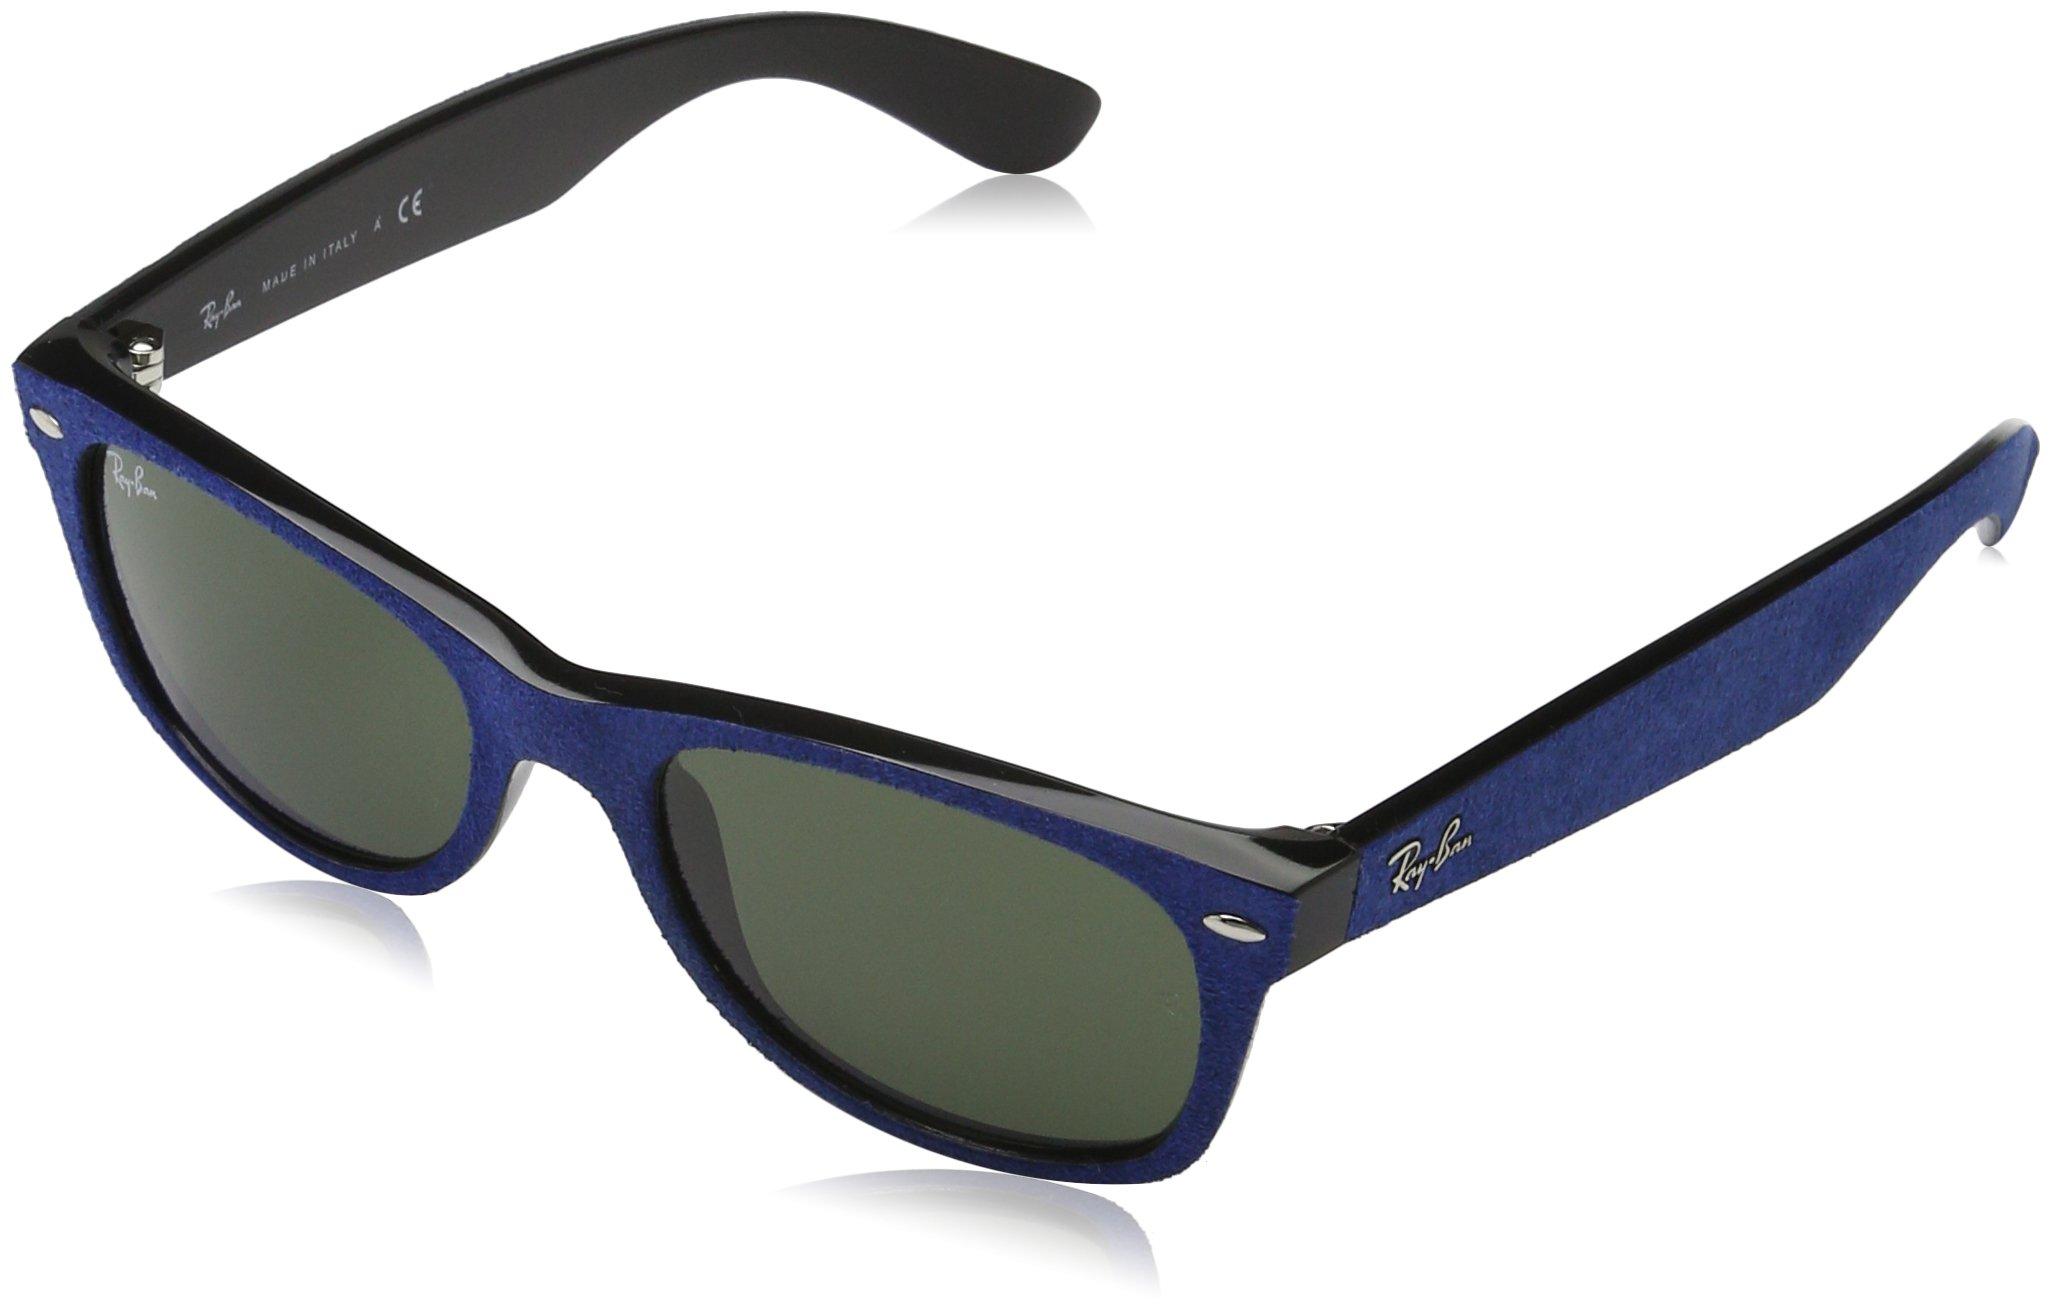 Ray-Ban Women's New Wayfarer Square Sunglasses, Black-Blue, 52 mm